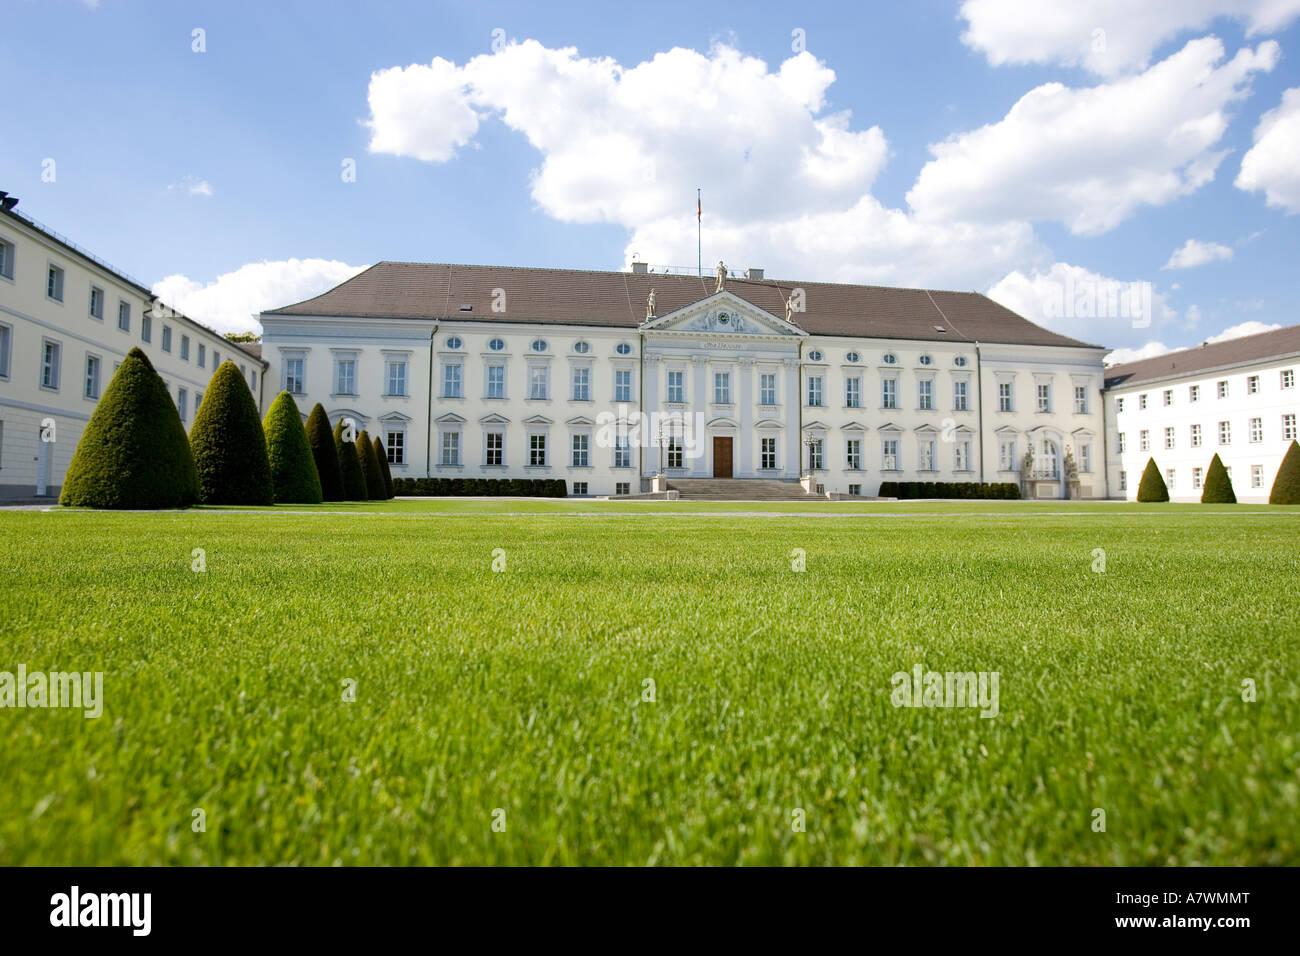 Castle Bellevue, domicile of the Federal President, Berlin, Germany - Stock Image